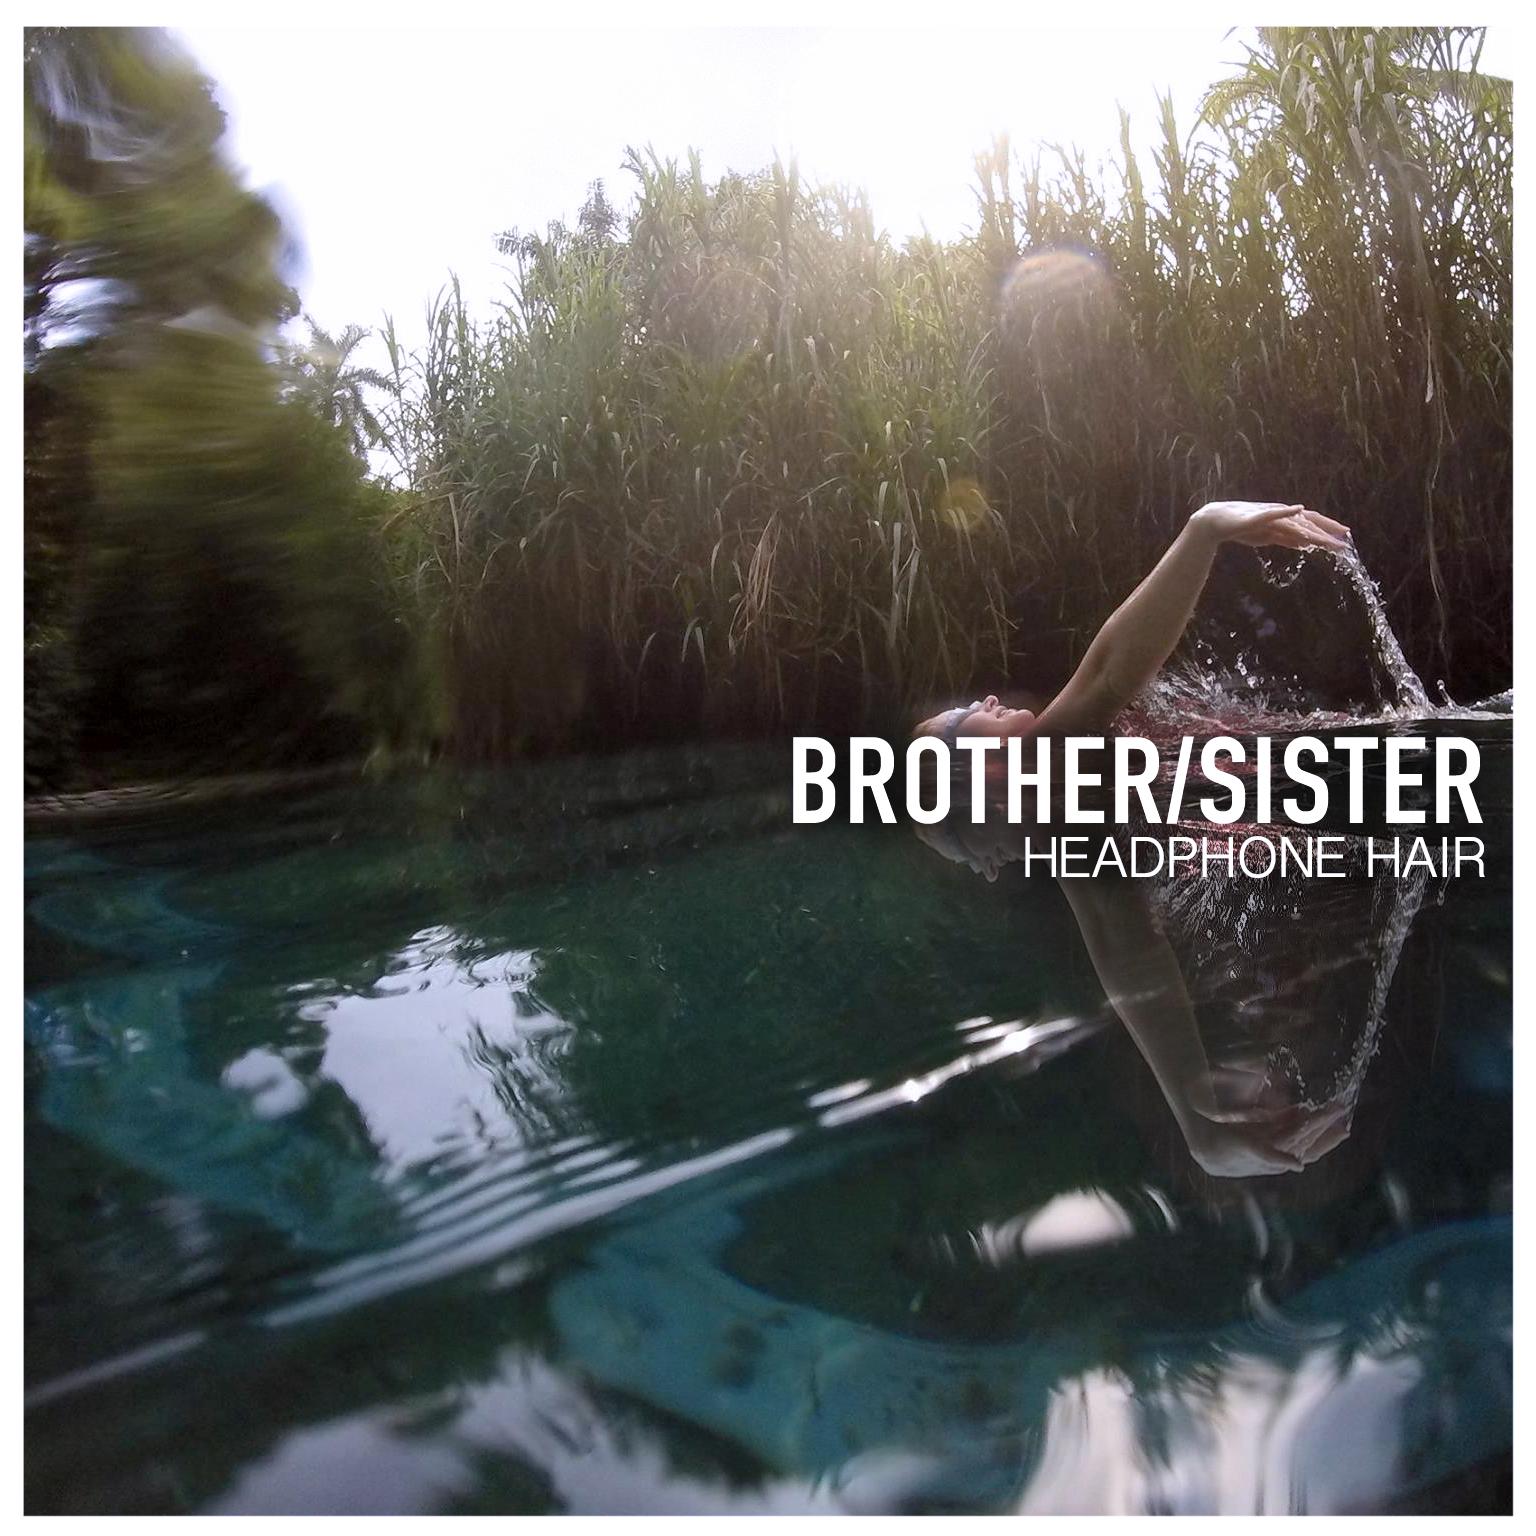 Headphone Hair - Brother/Sister